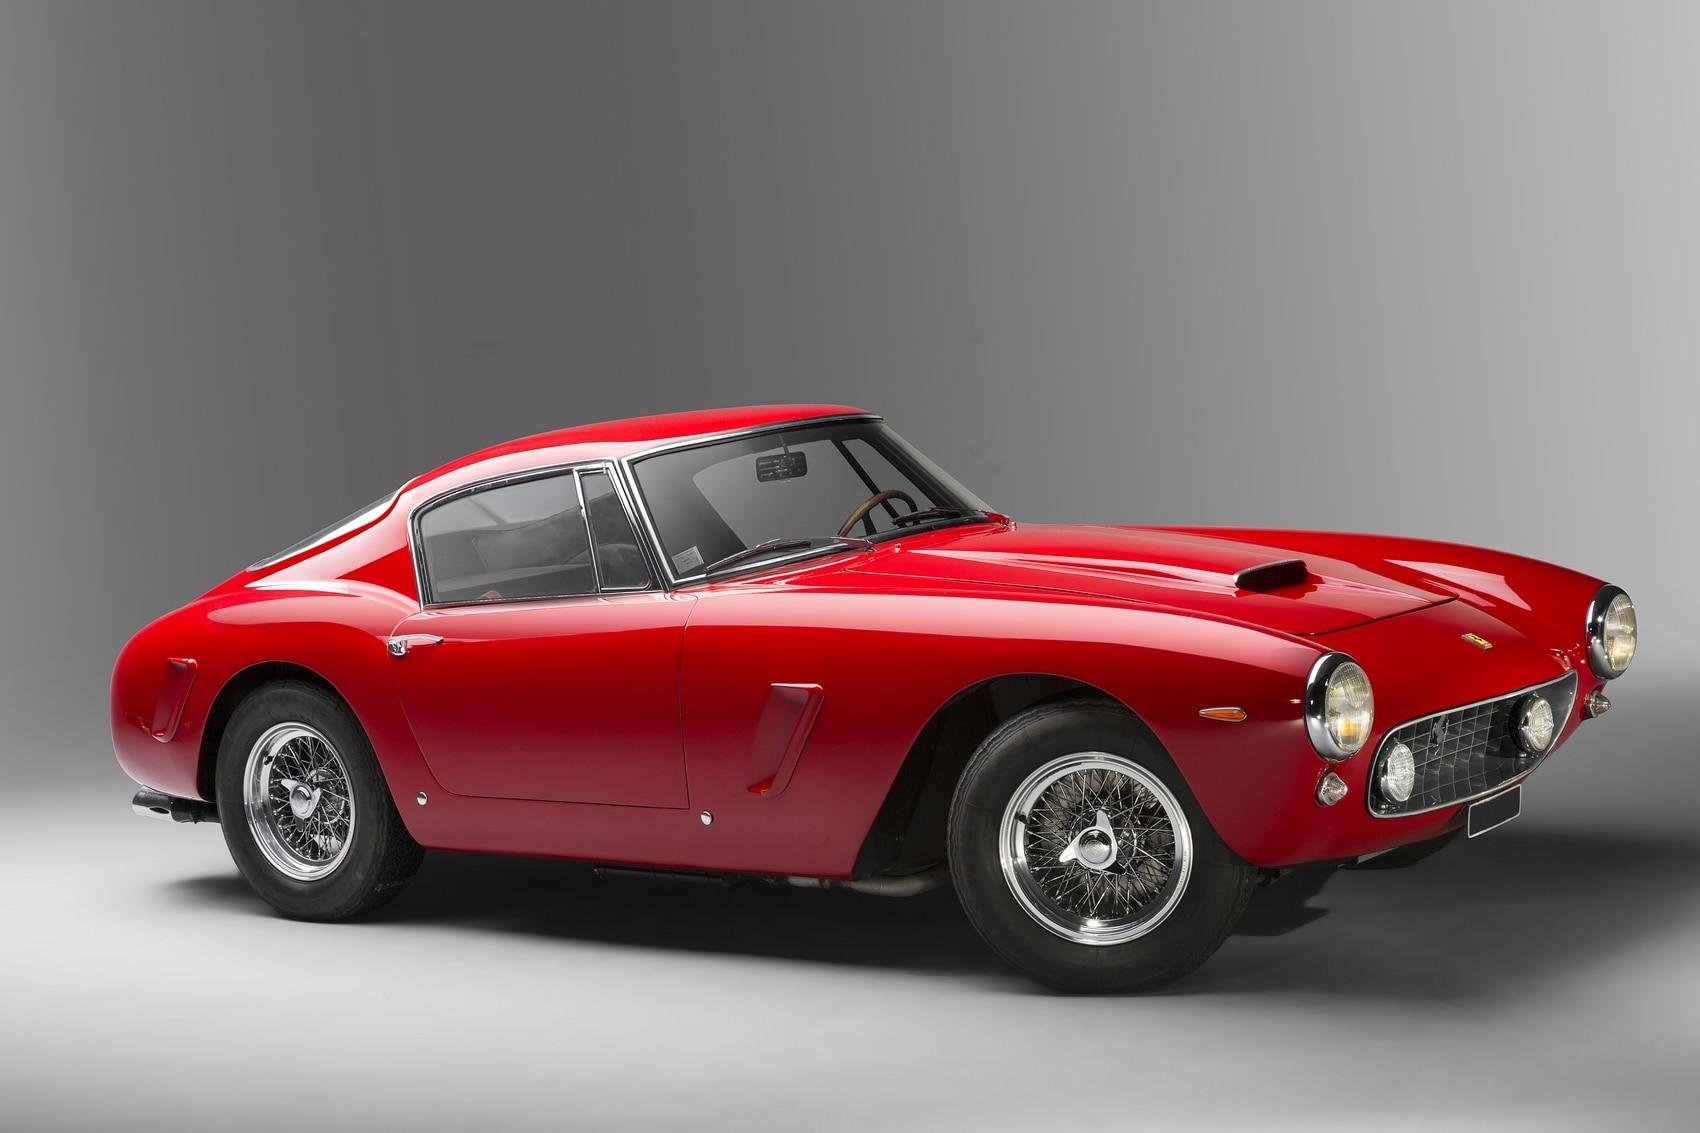 ferrari-250-swb-2917gt-le-mans-classic-artcurial-2016-ruoteclassiche Terrific Ferrari Mondial Cabrio In Vendita Cars Trend